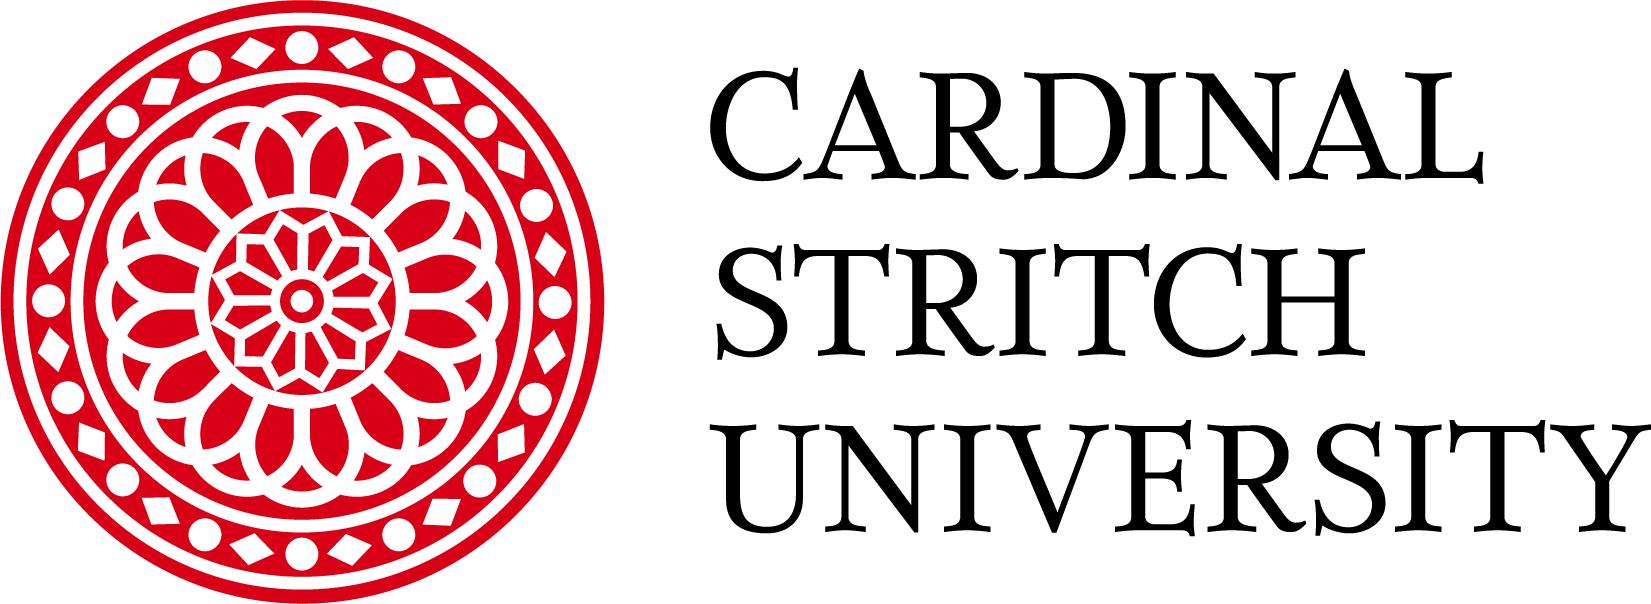 Cardinal Stritch logo